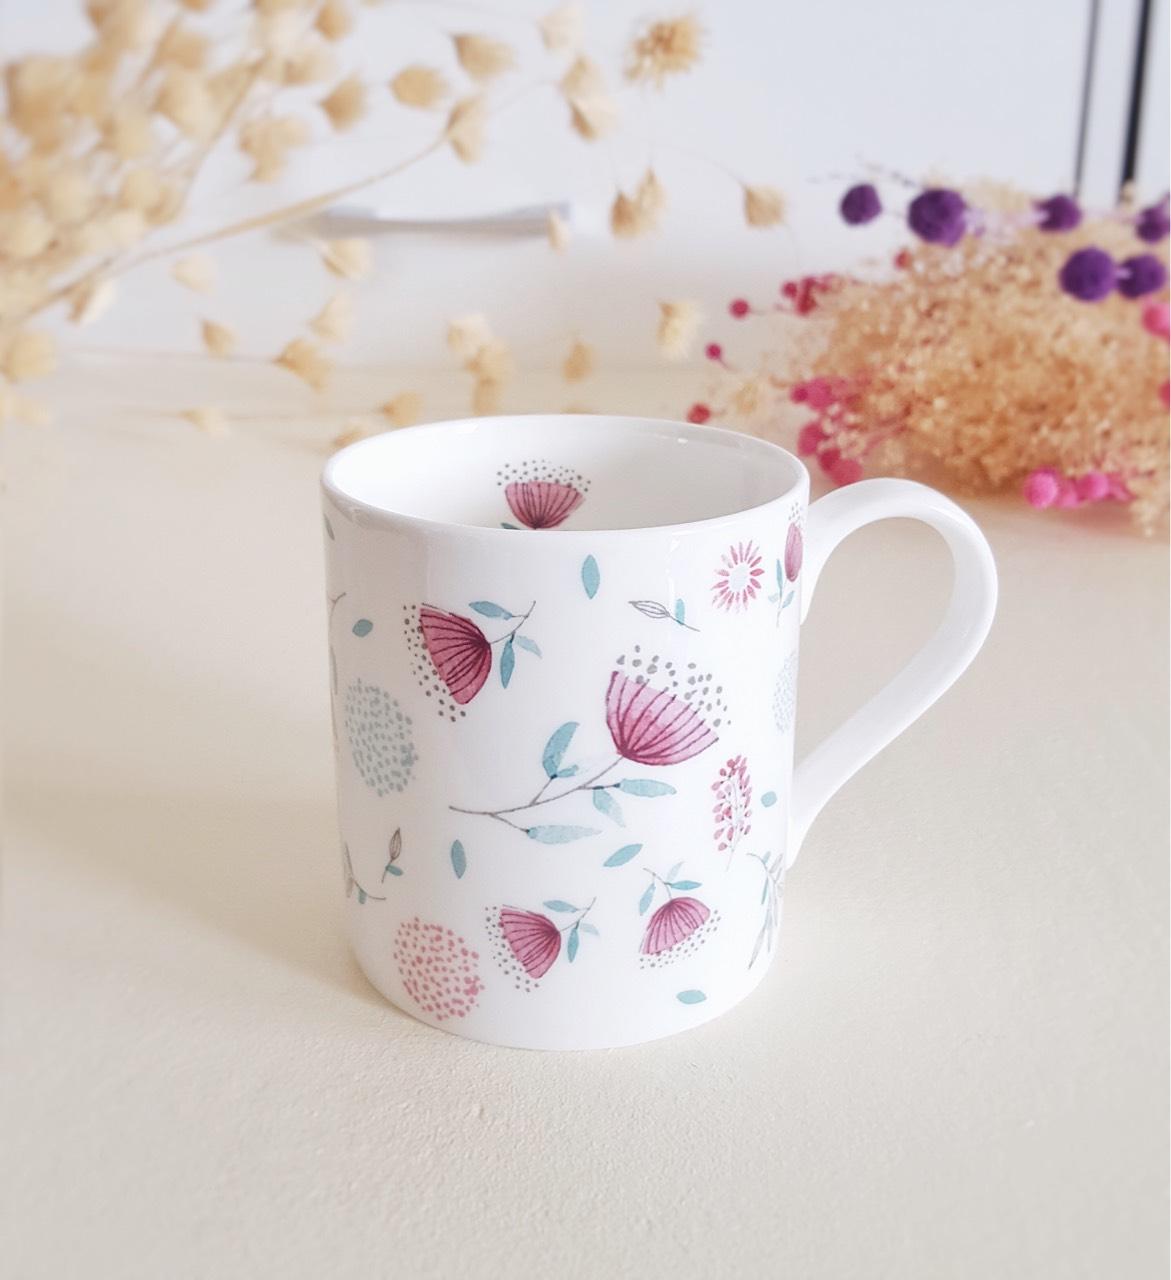 ceramic,mug,cup,homedecor,floral,banchulee,แก้ว,เซรามิค,zakka,shabbychic,bonechina,BanChulee